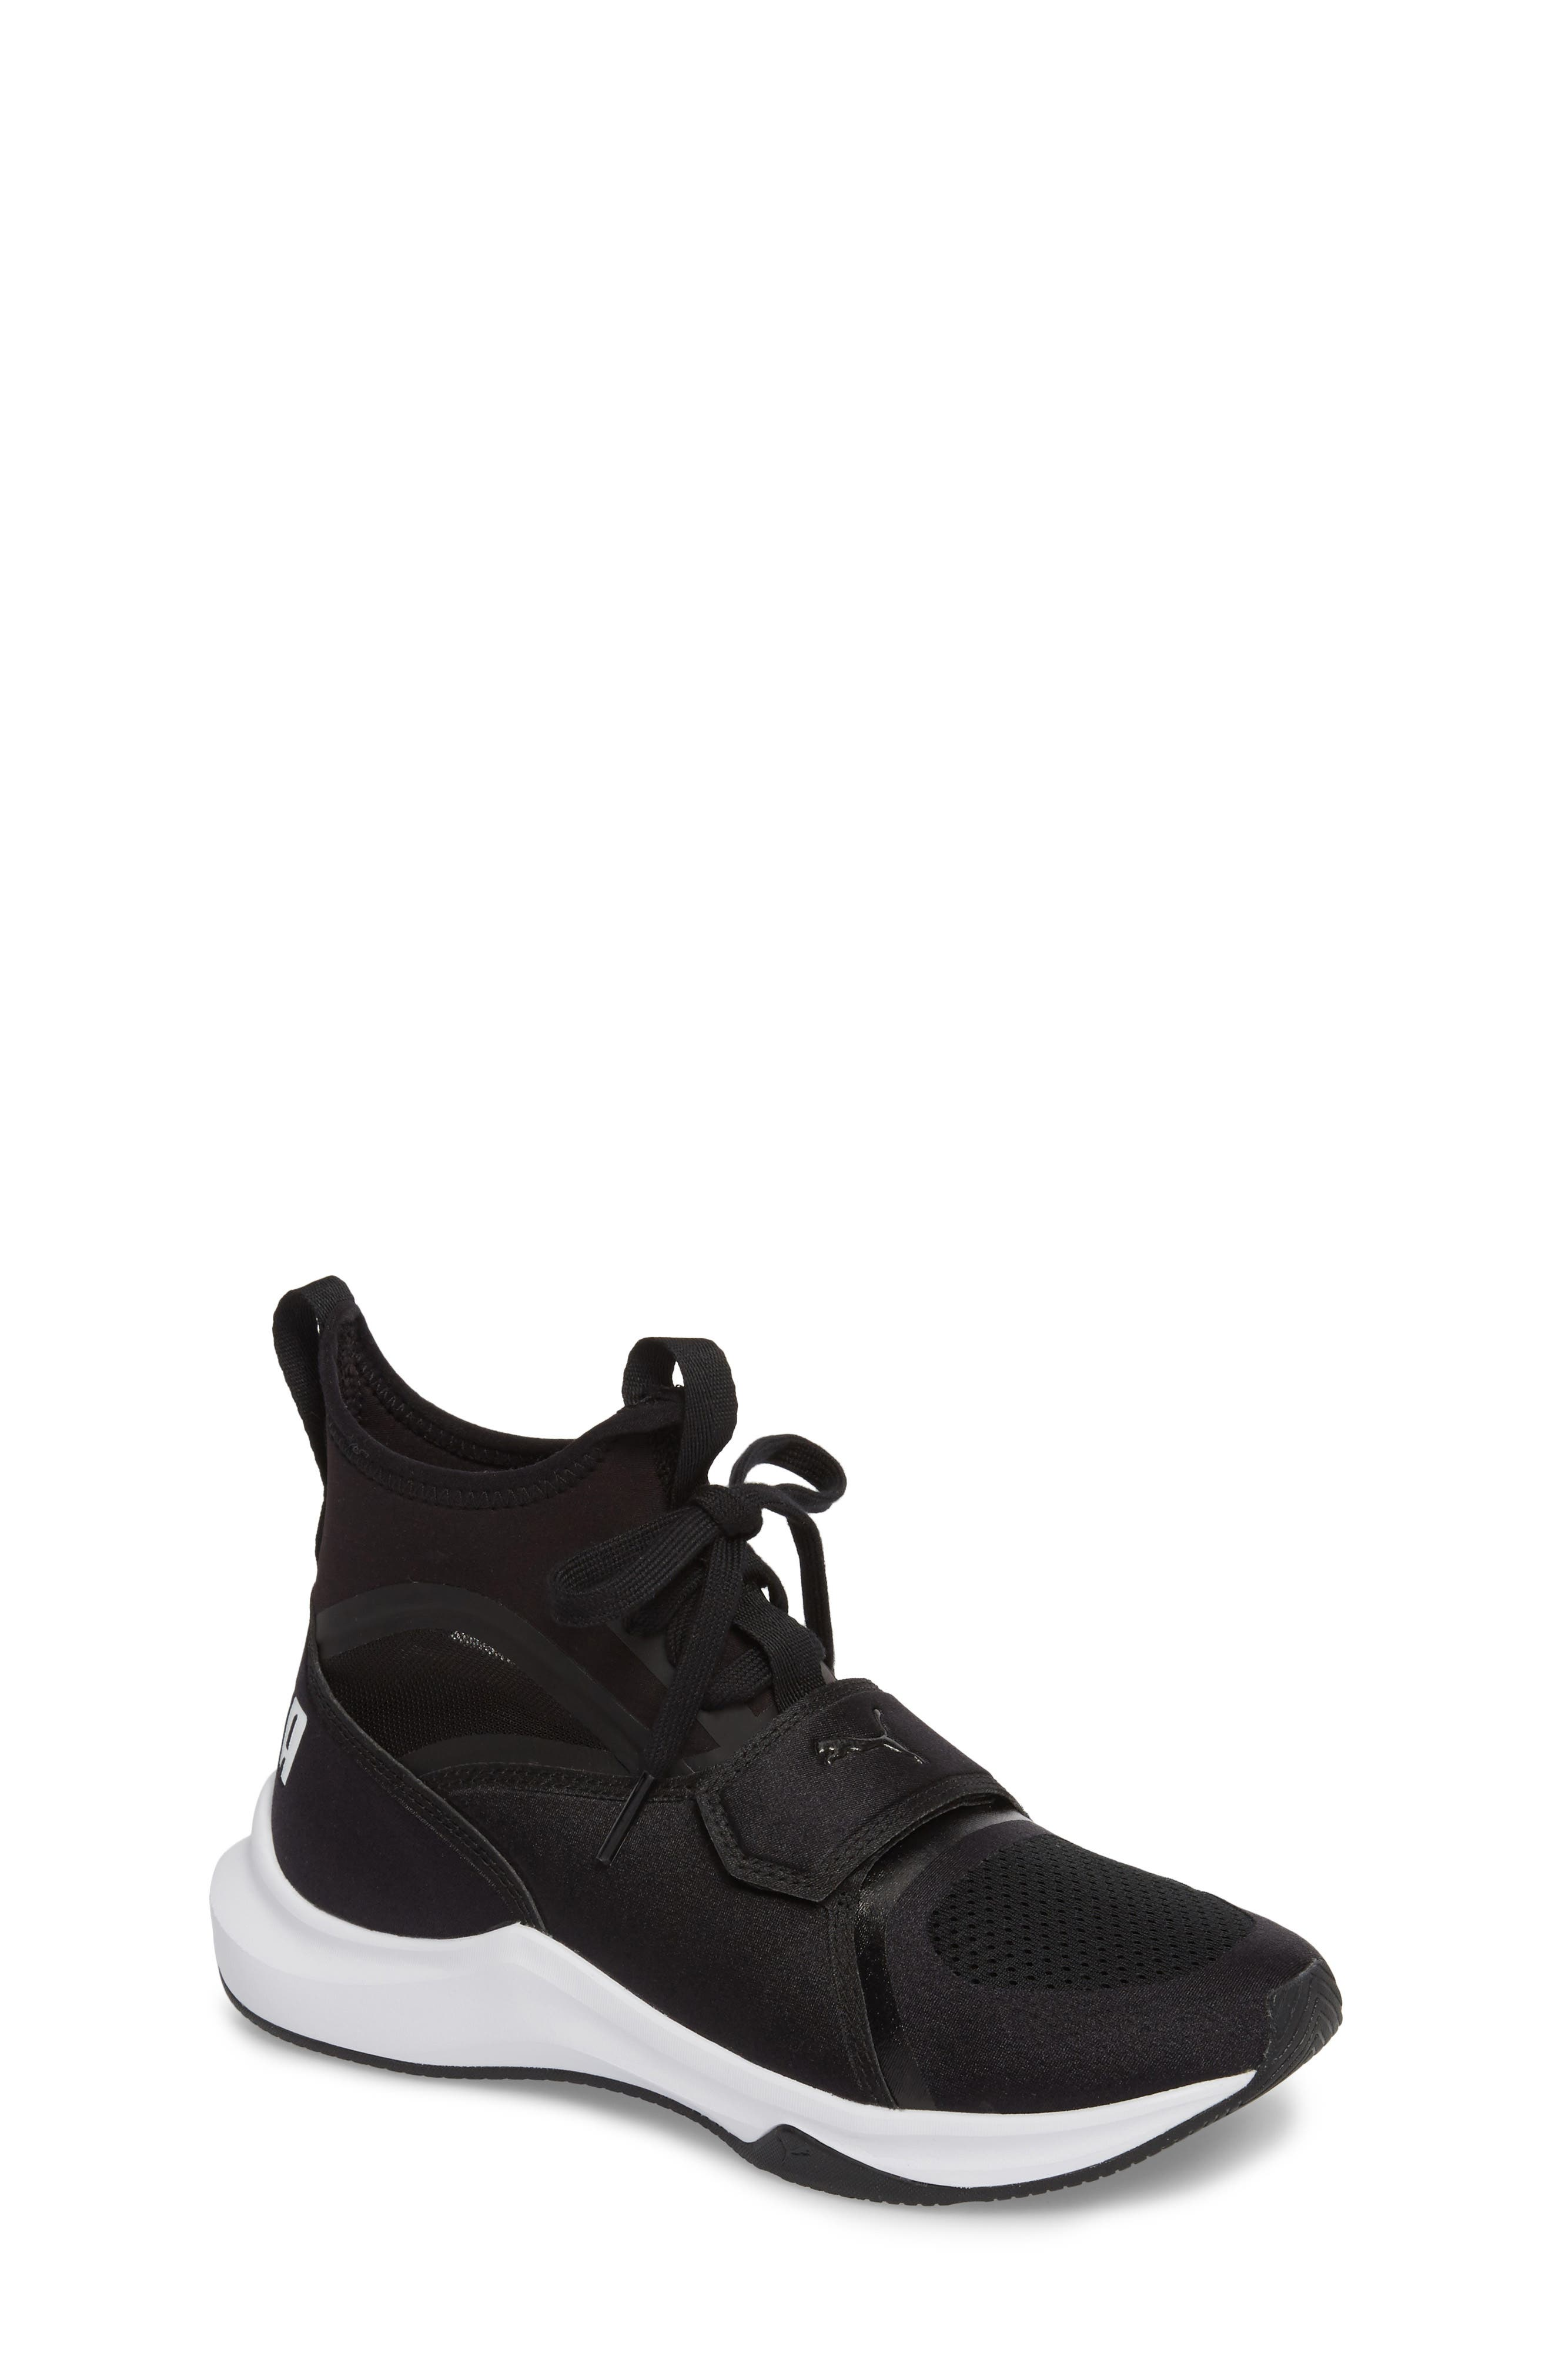 PUMA Phenom Jr High Top Sneaker (Big Kid)